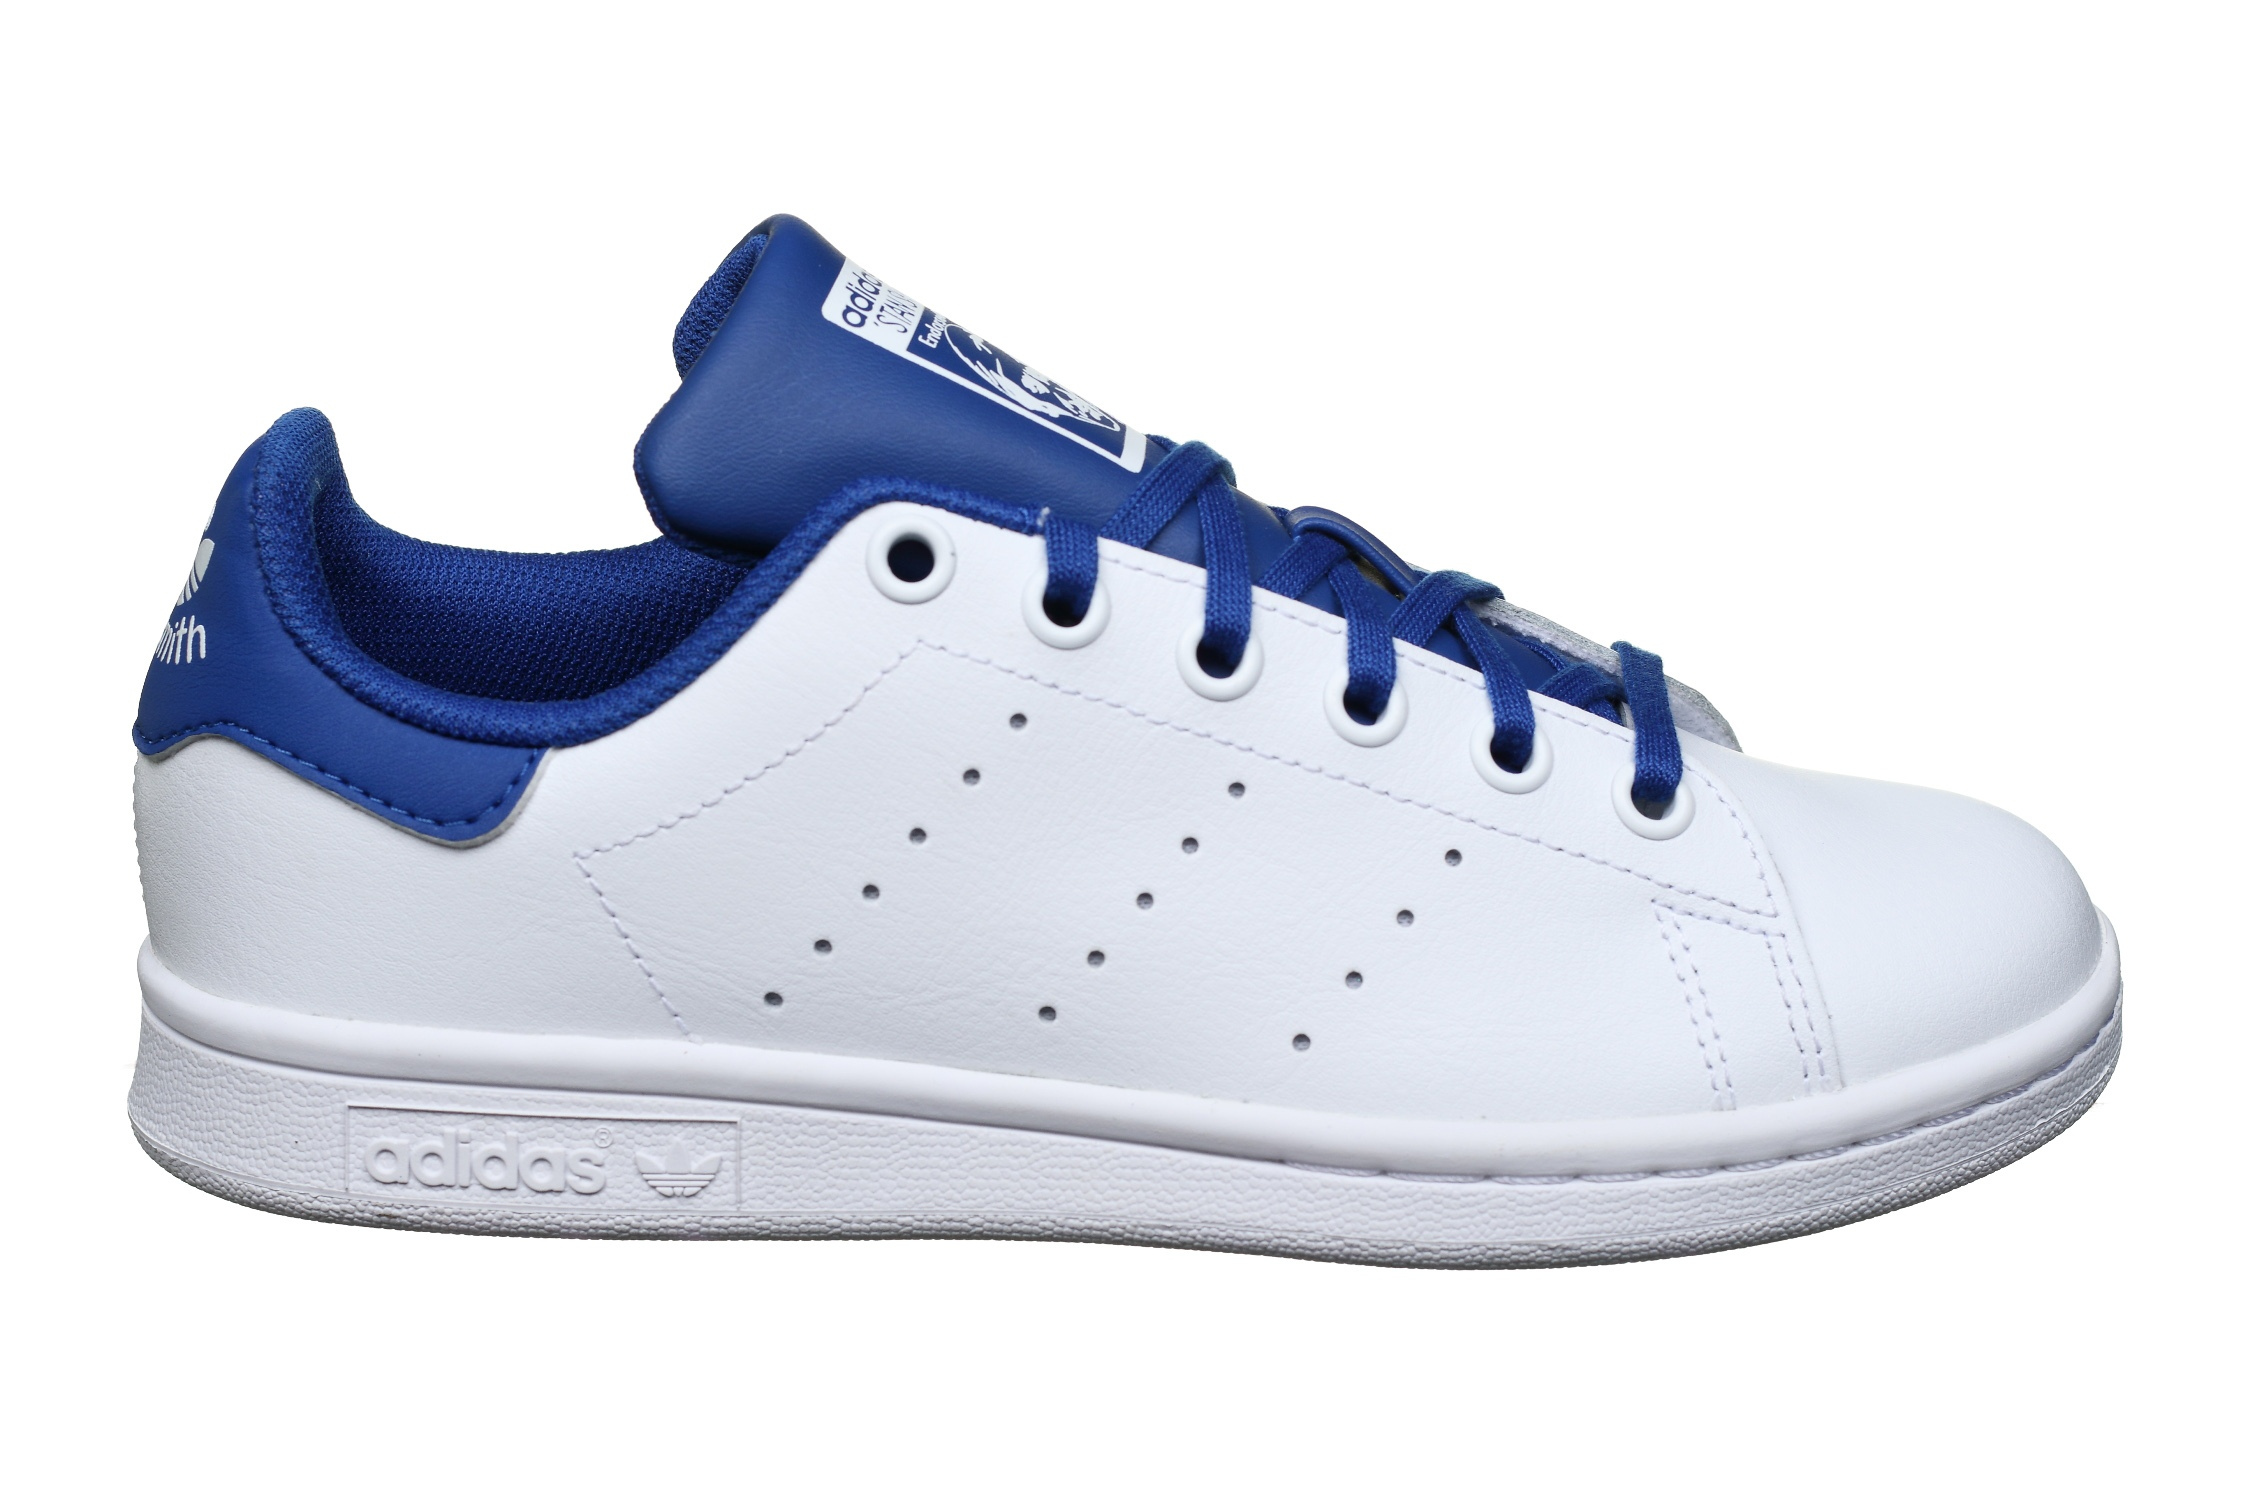 https://www.leadermode.com/194843/adidas-stan-smith-j-fw4492-blanc-bleu.jpg